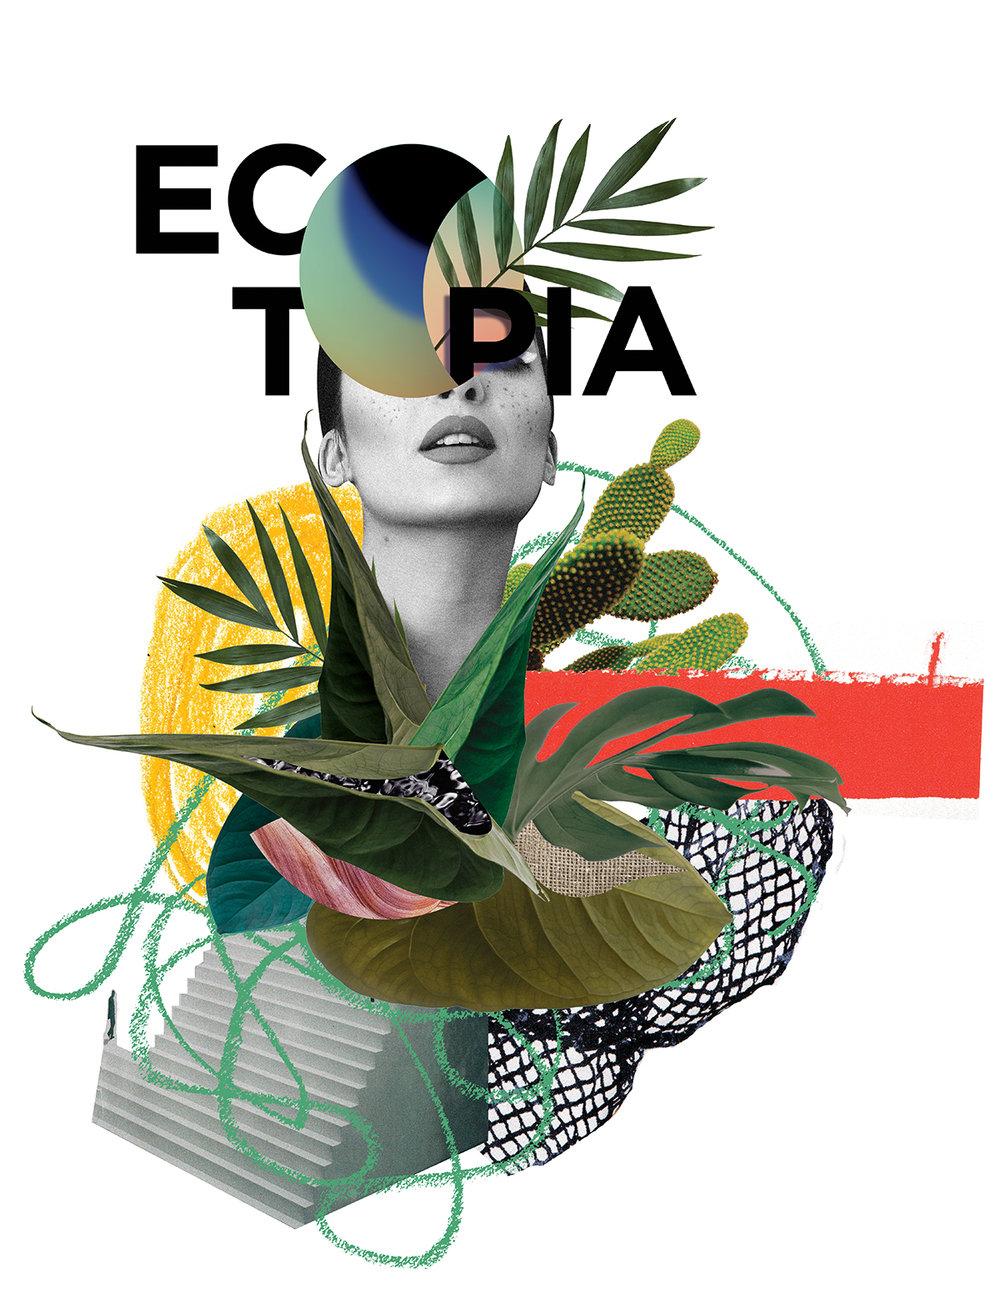 Ecotopia_2018_image1_LR_RGB.jpg